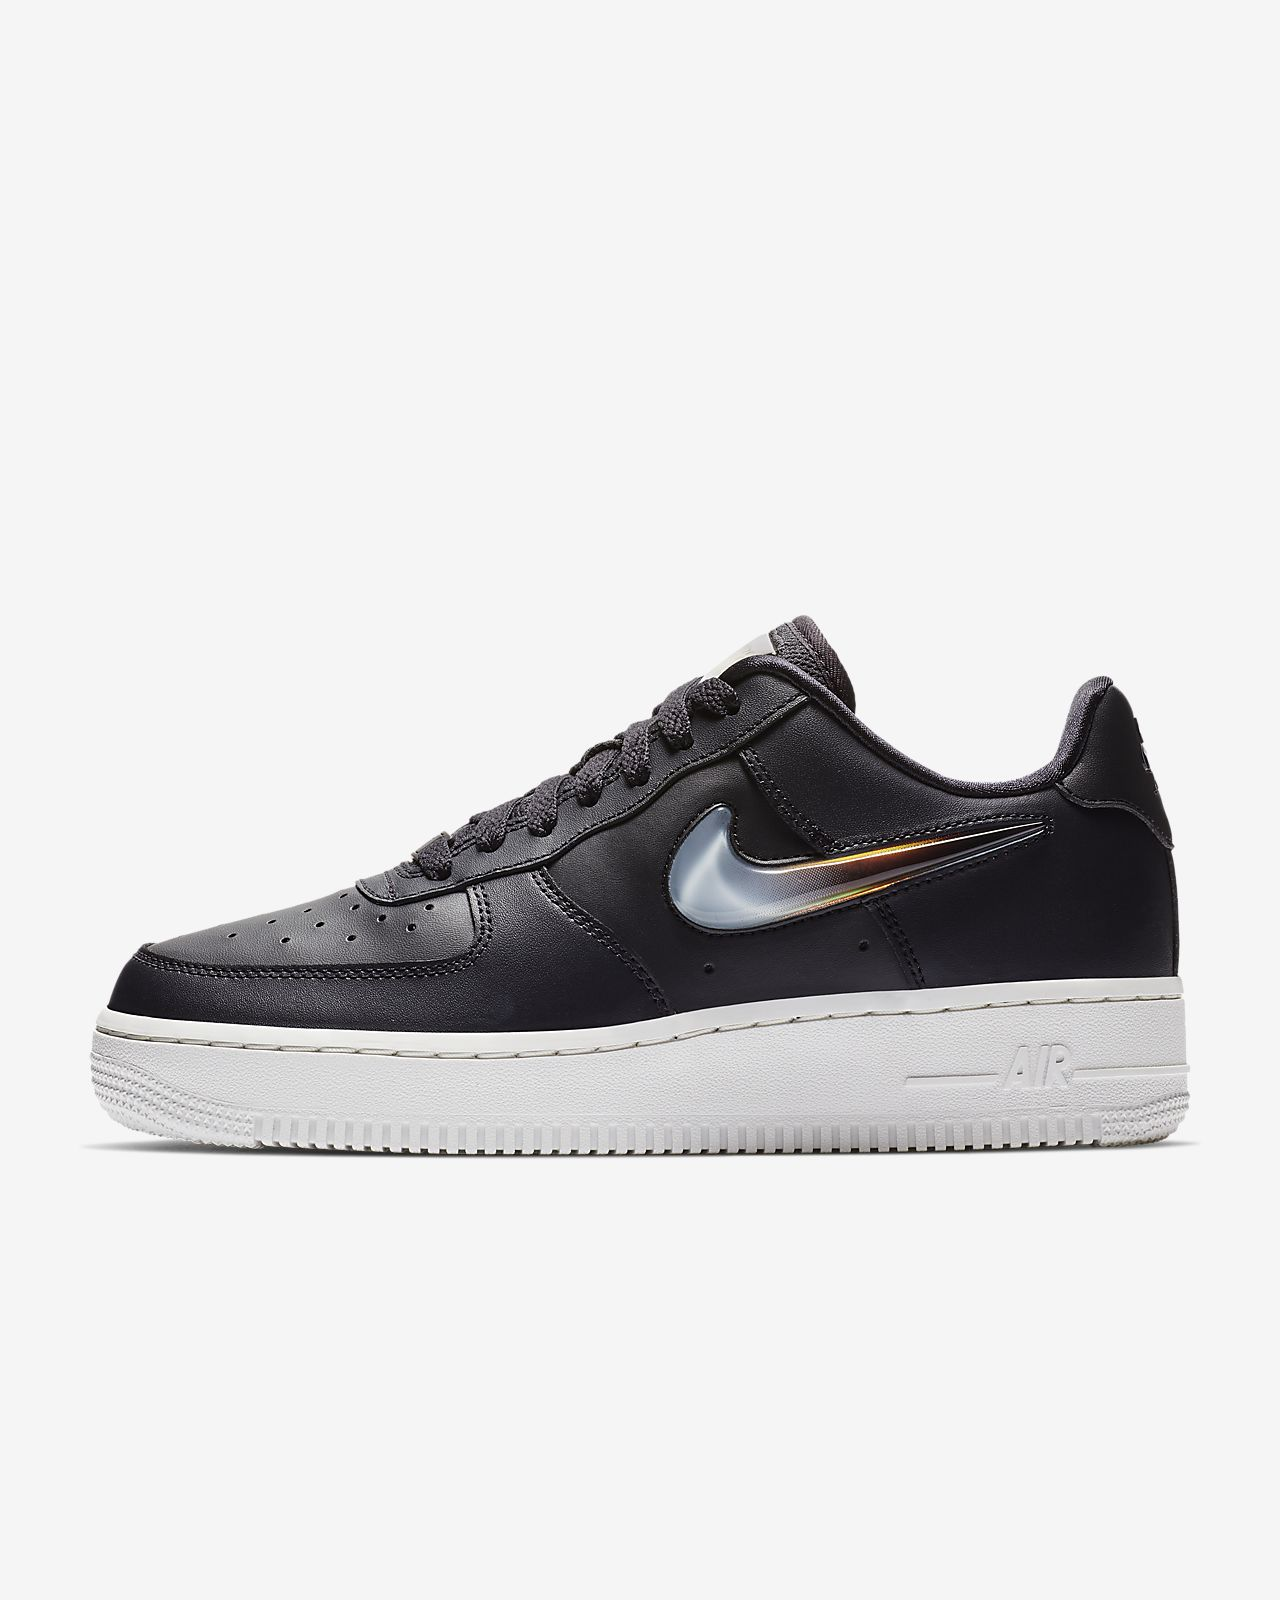 separation shoes 1e760 5e3f5 ... Sko Nike Air Force 1  07 SE Premium för kvinnor